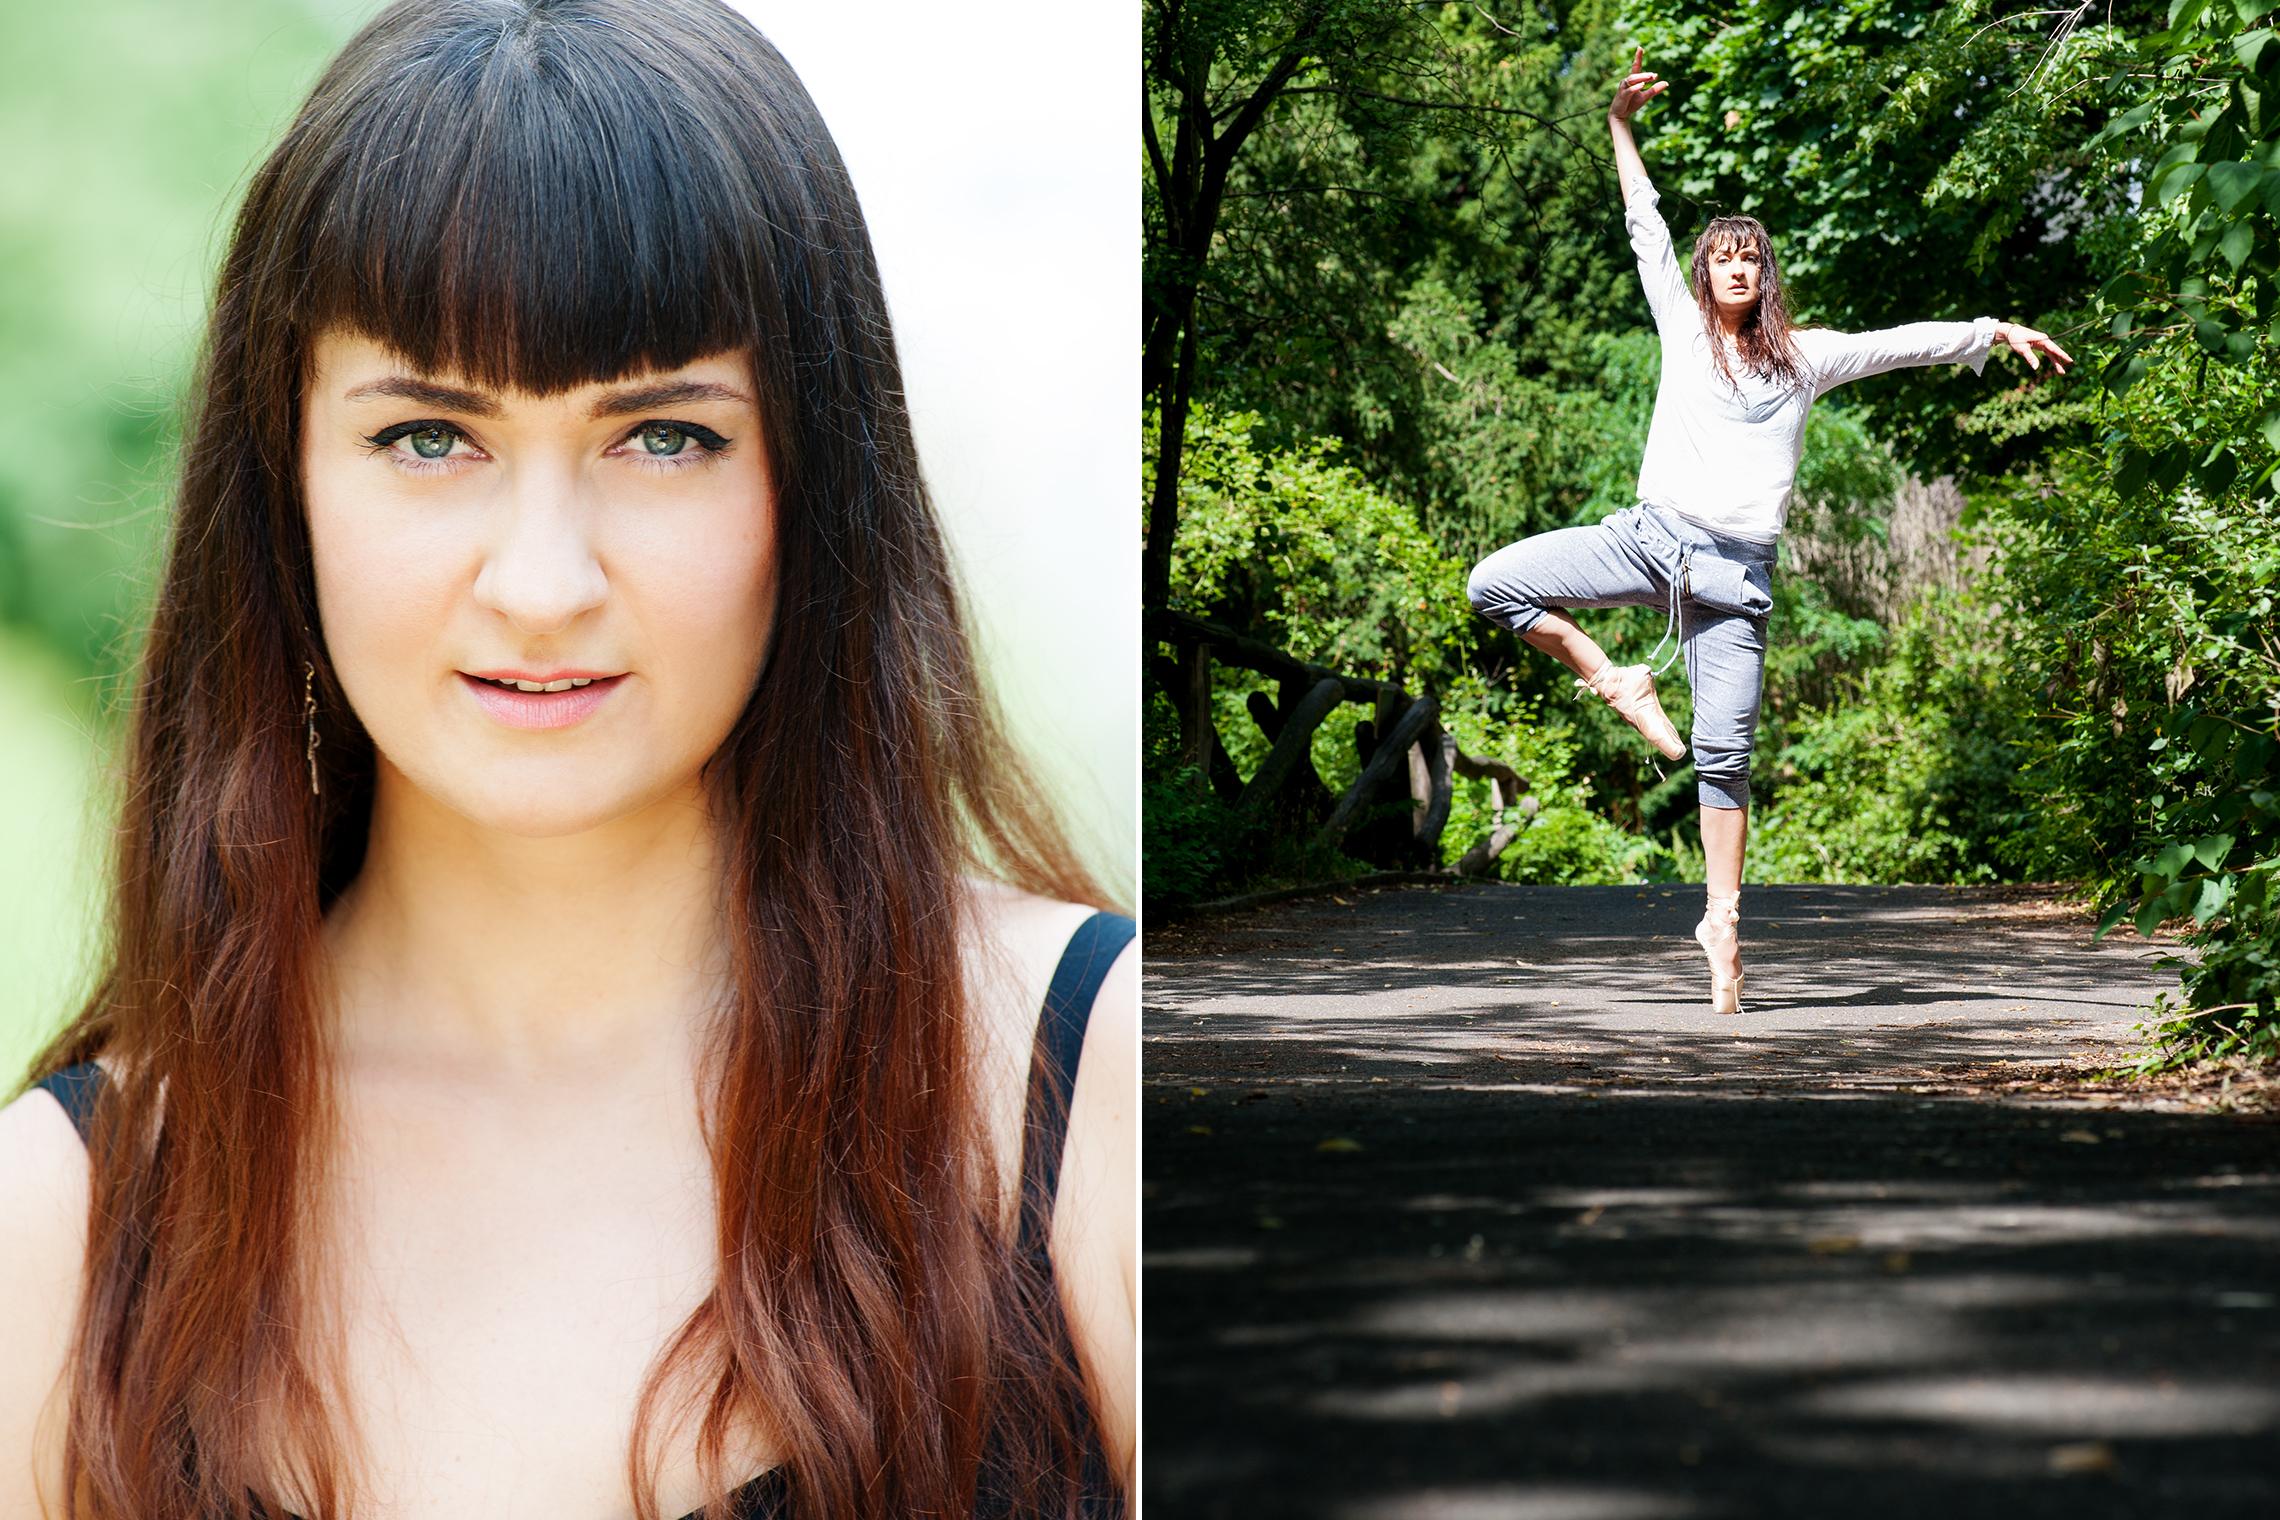 TänzerinnenFoto-FotoCaroHoene-Künstlerportrait-105